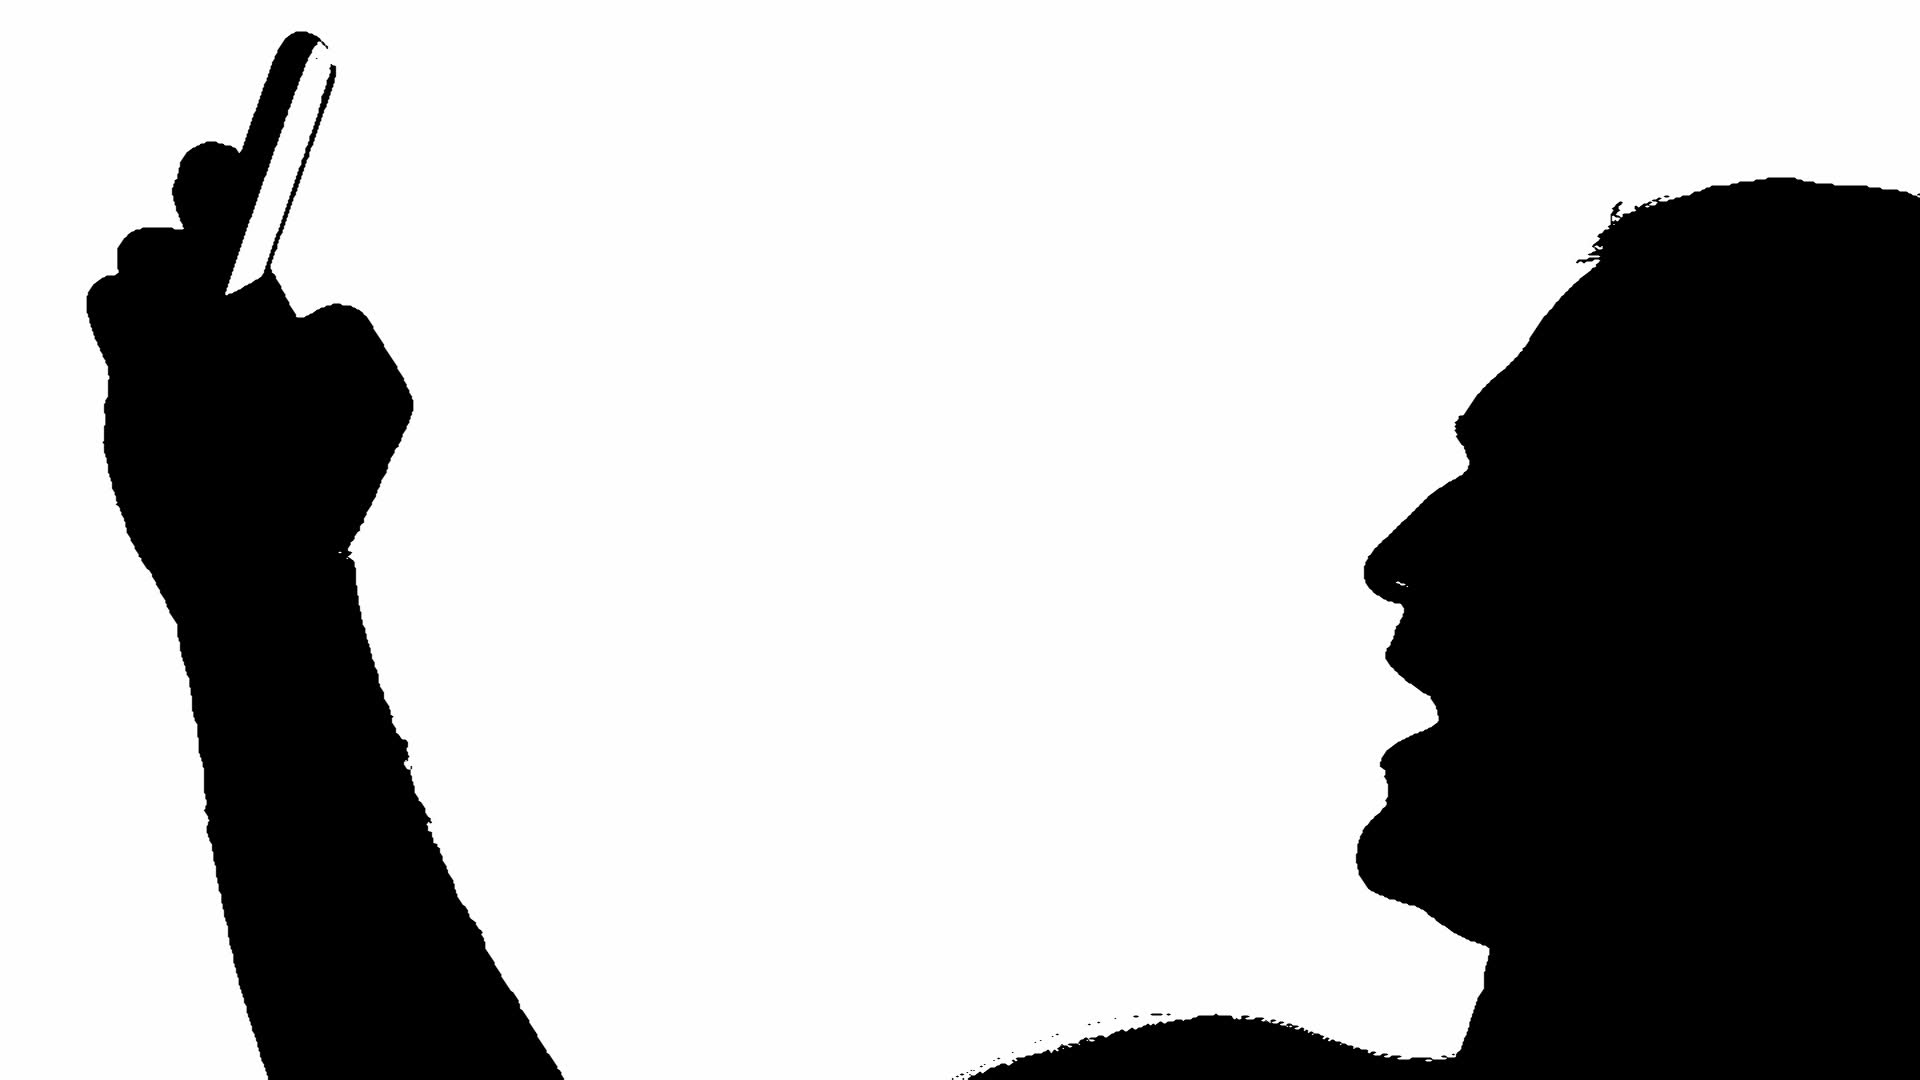 1920x1080 selfie silhouette 1.jpg Clipart Panda